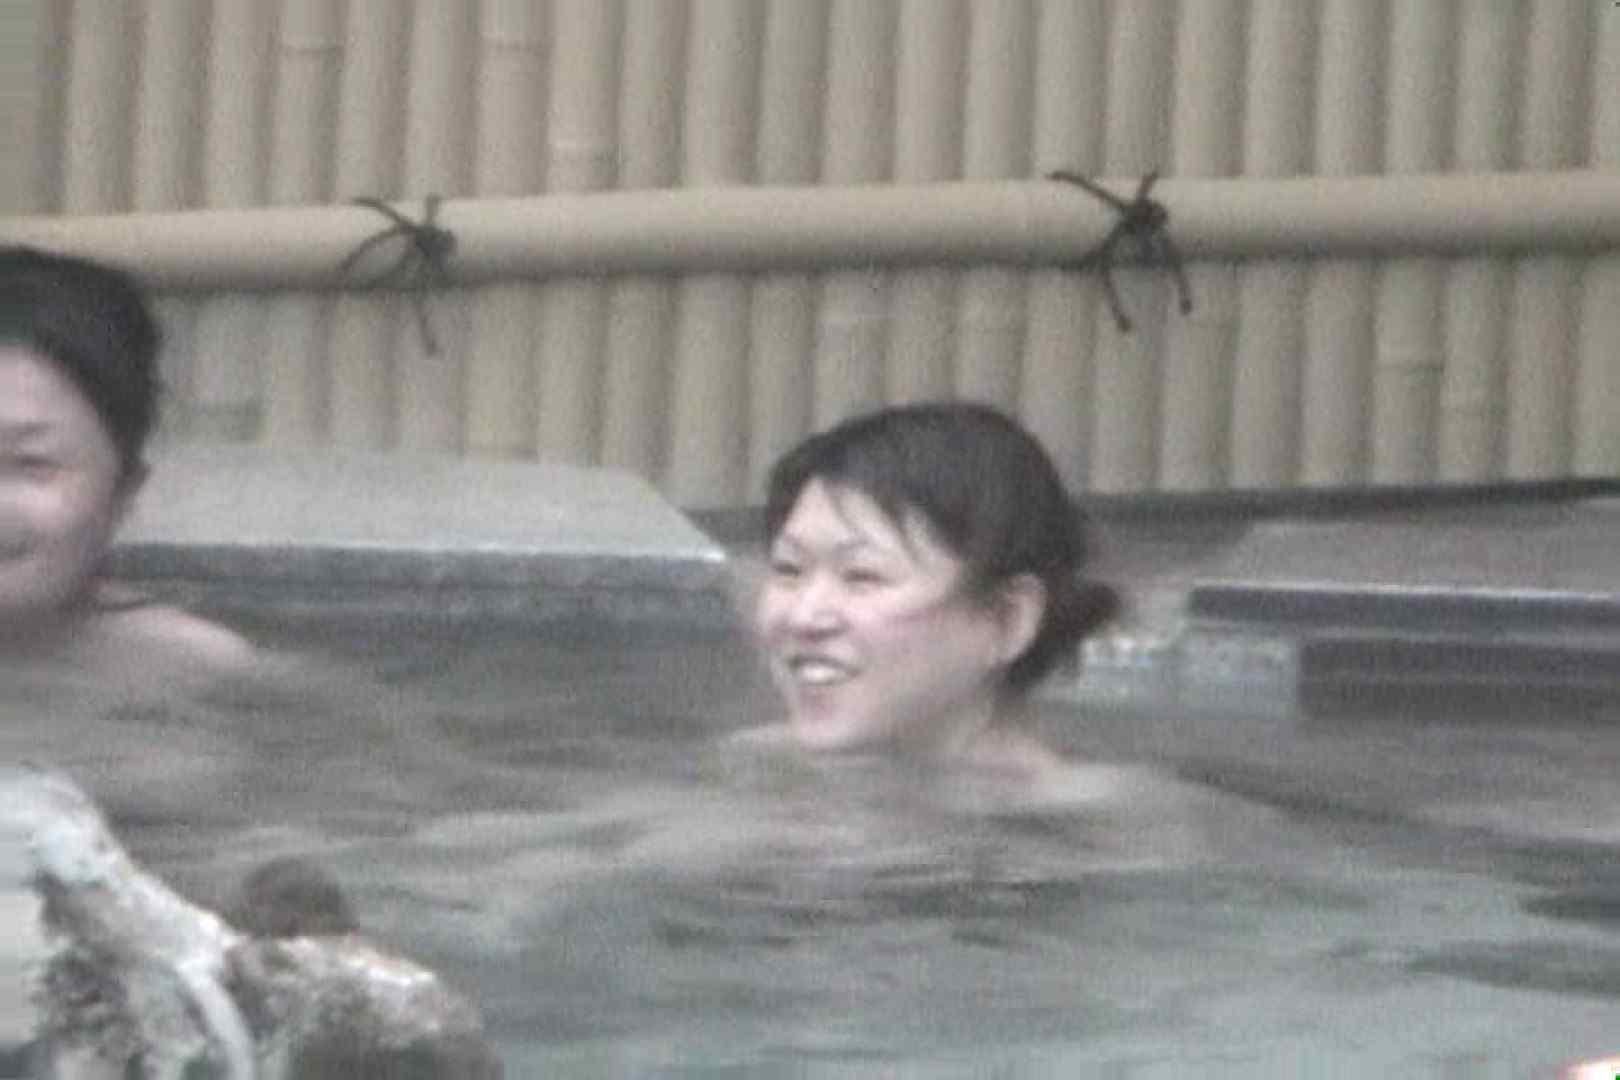 Aquaな露天風呂Vol.555 OLセックス 盗撮オメコ無修正動画無料 100画像 44